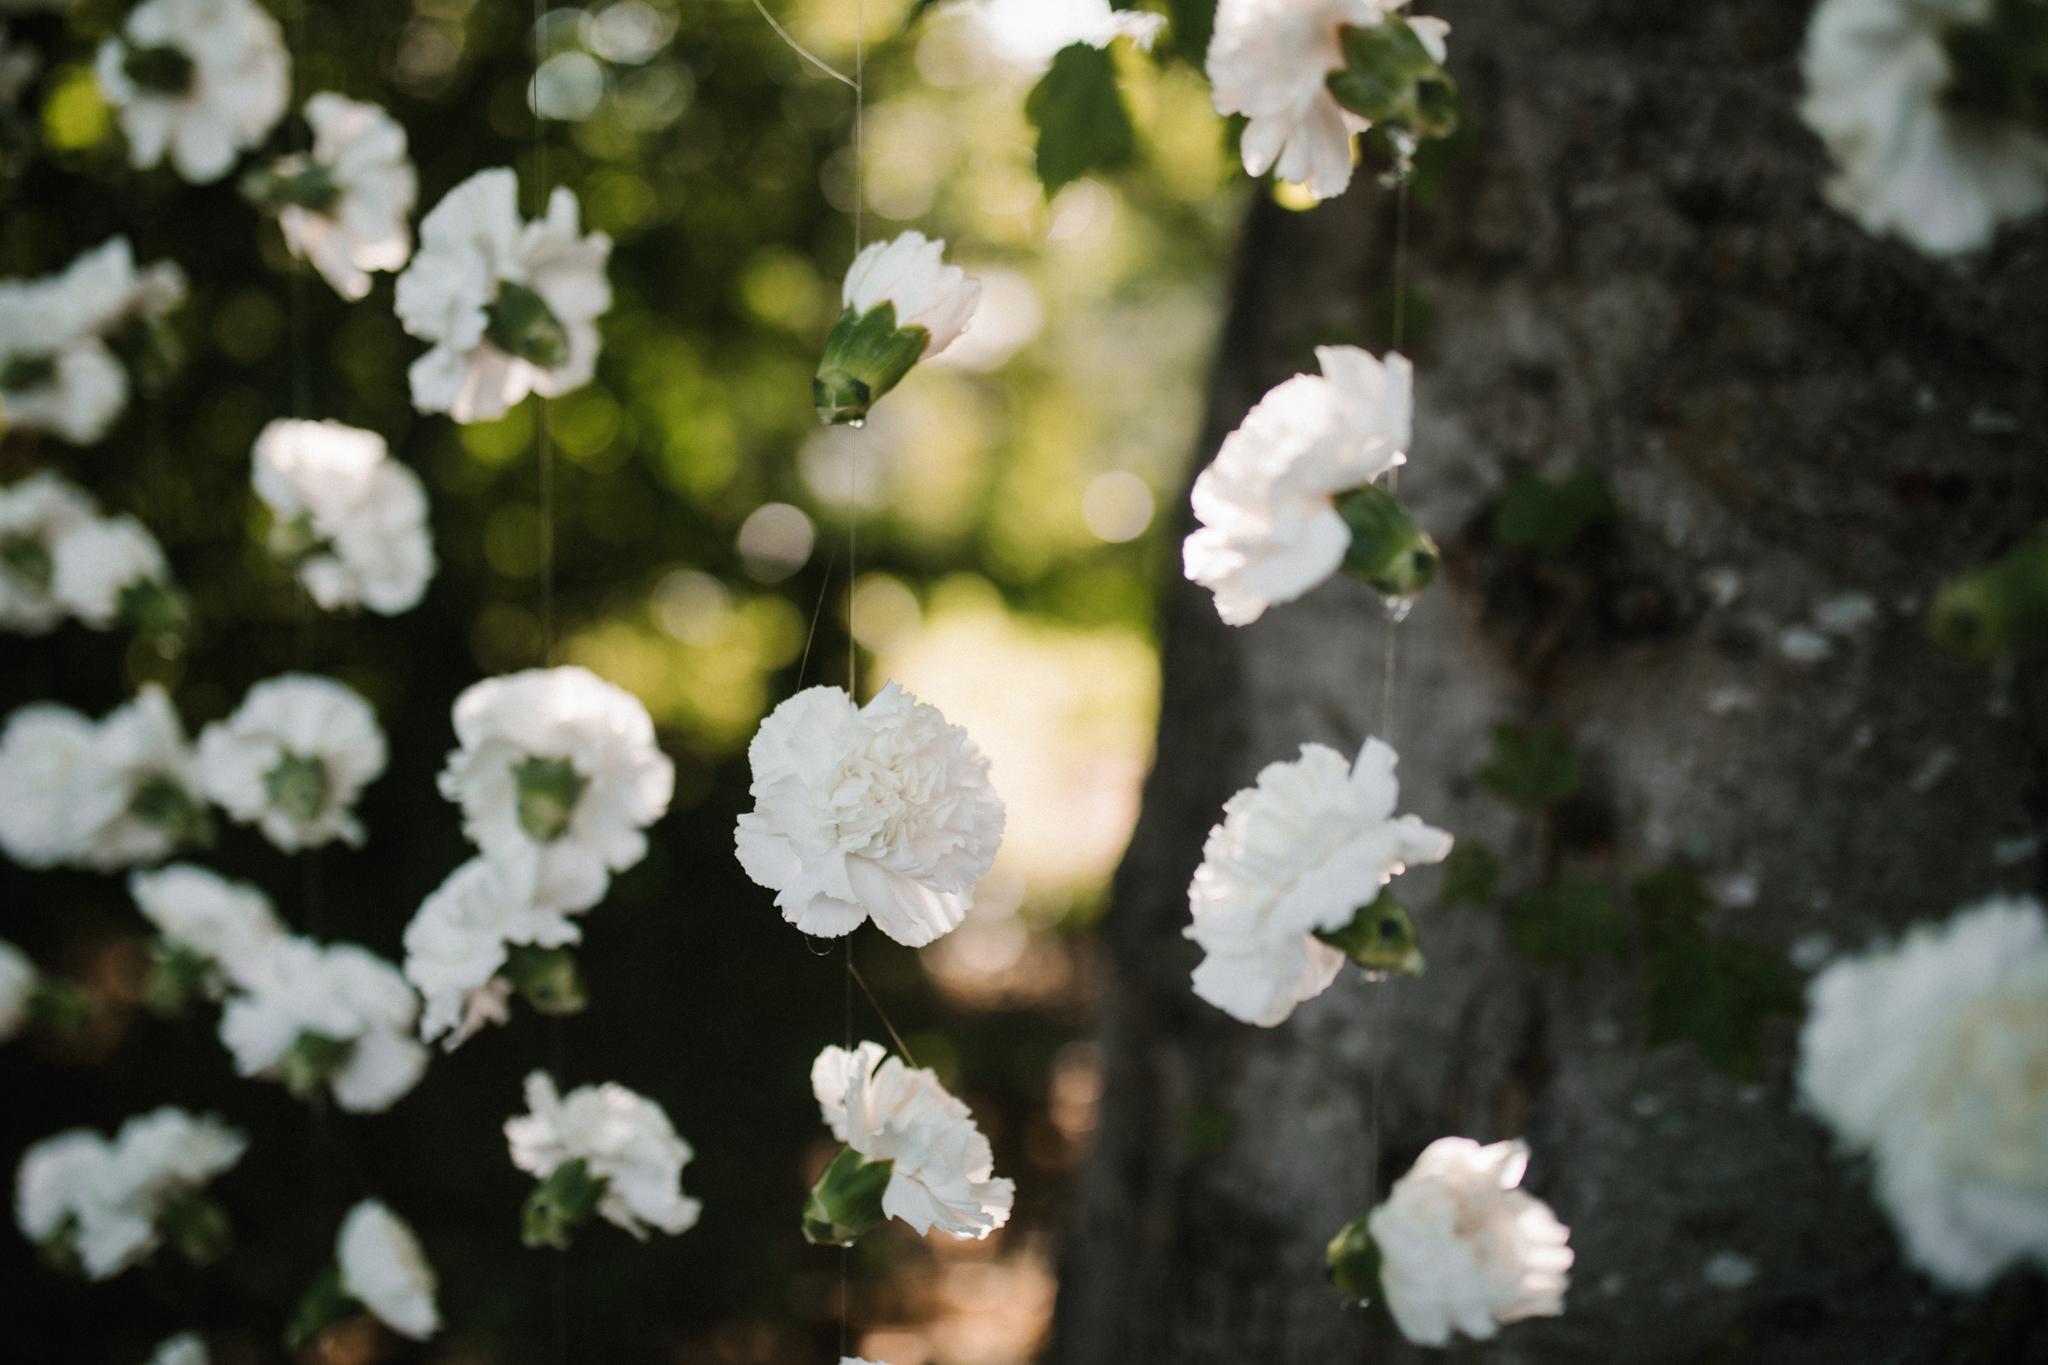 dorota_dwight_richmond_backyard_wedding-7.jpg